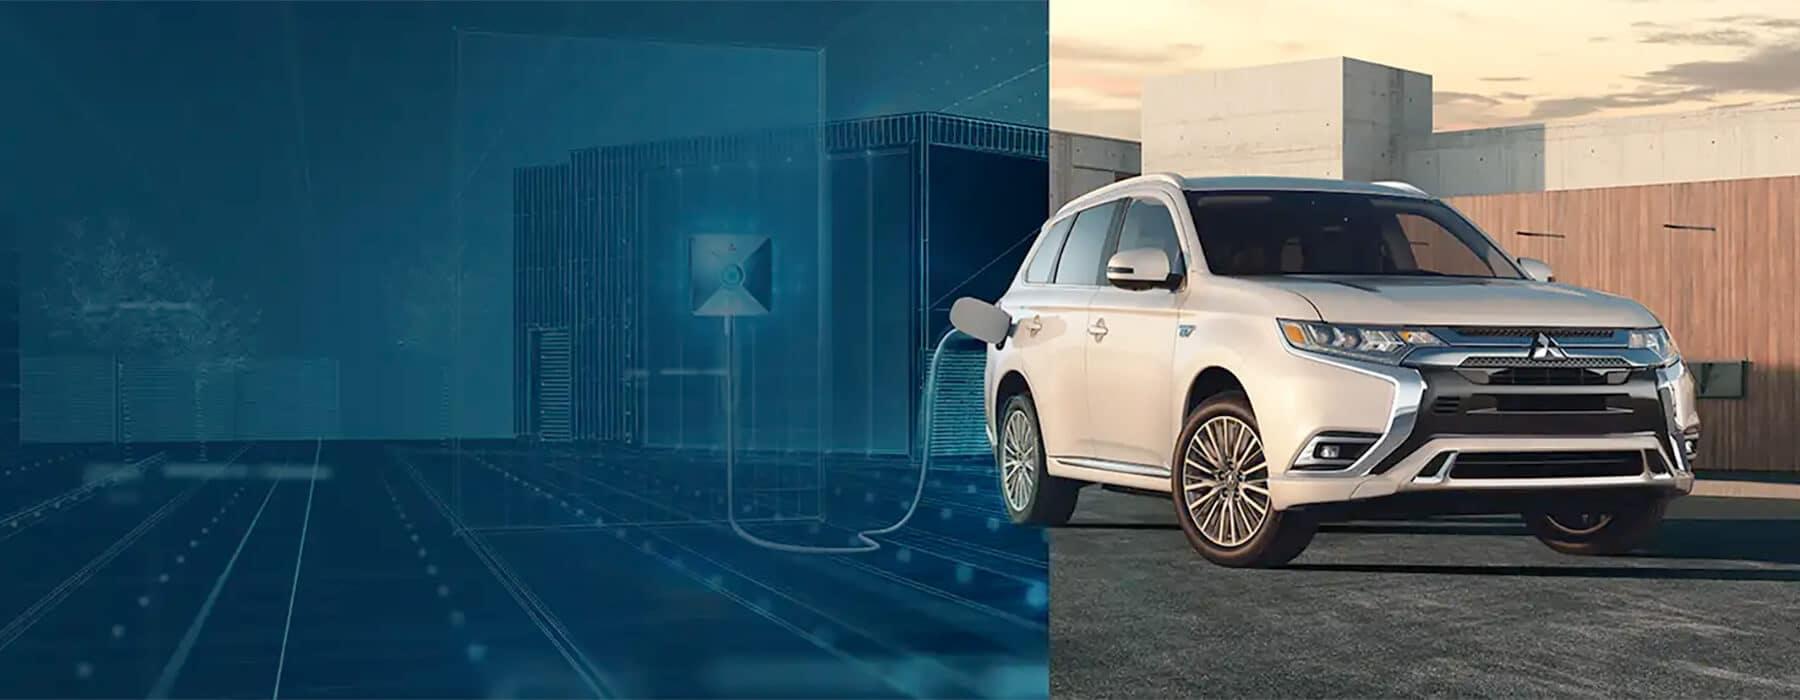 Mitsubishi Hybrids and Electric Cars Slider